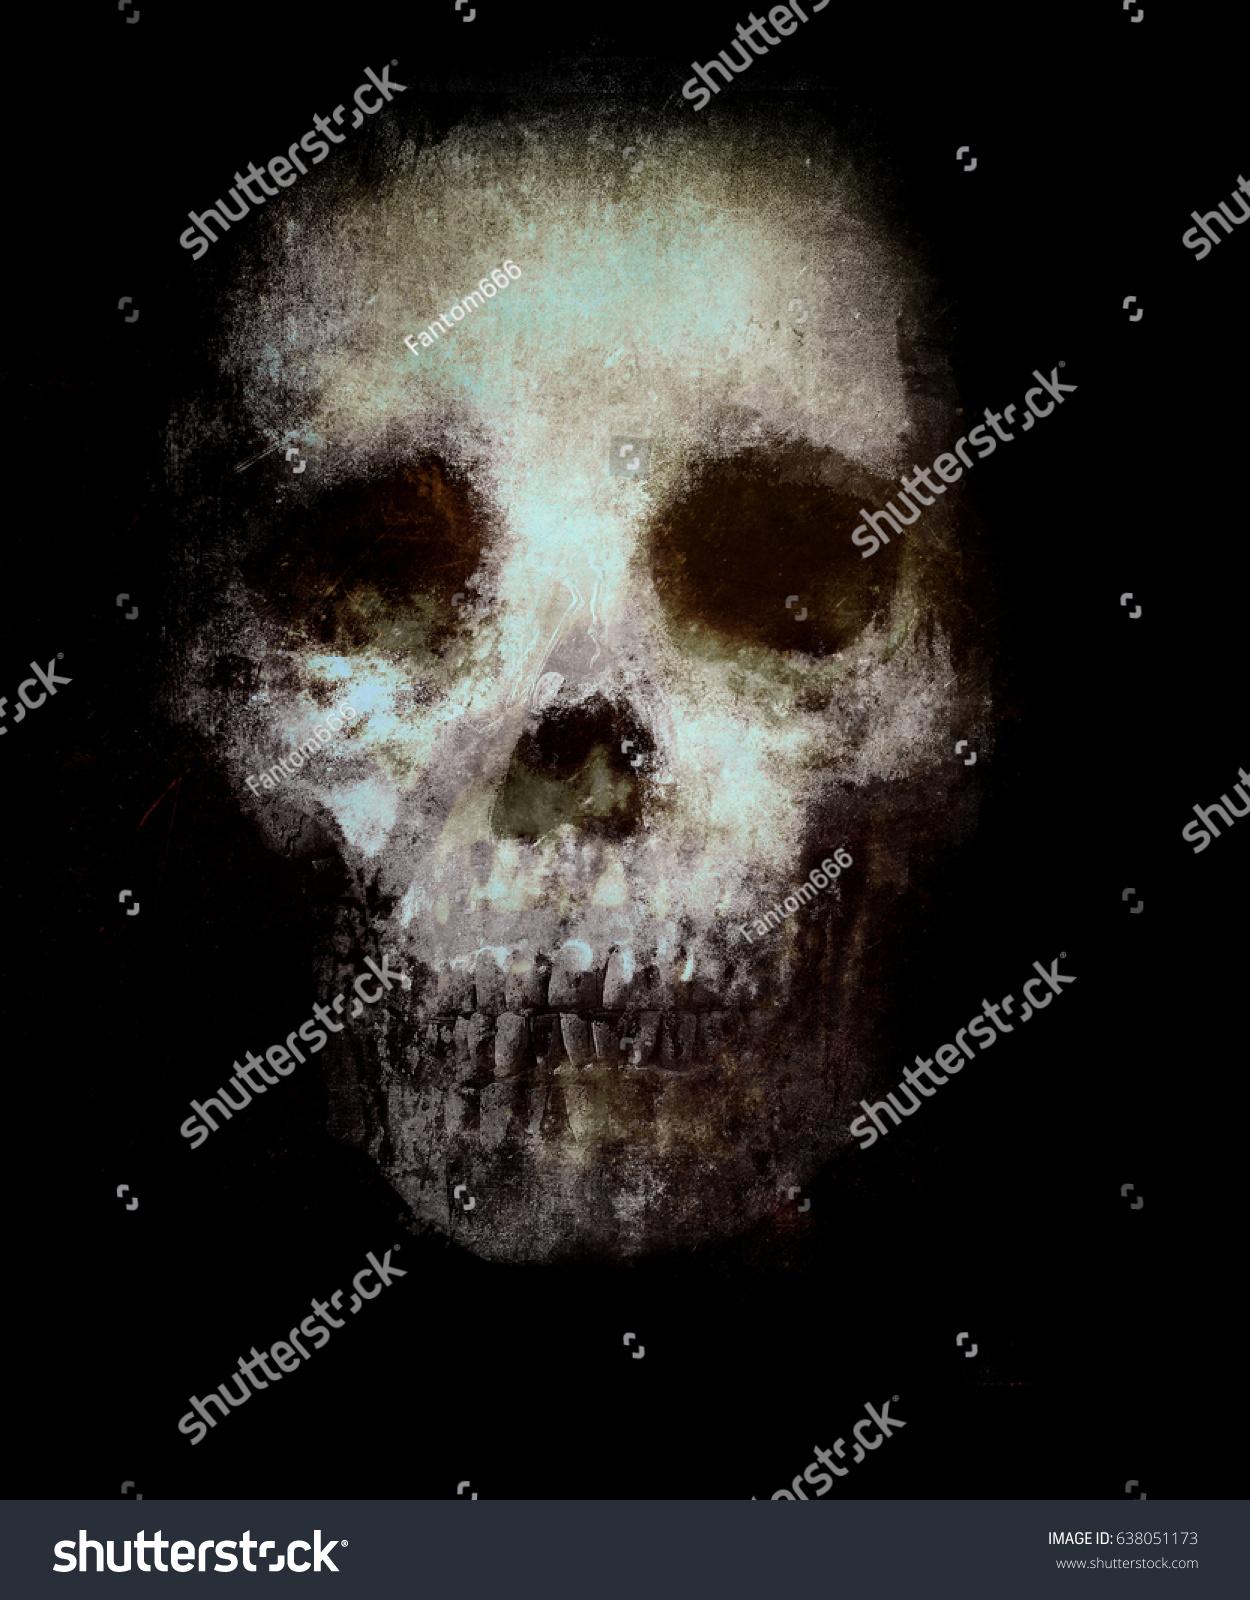 Amazing Wallpaper Halloween Spooky - stock-photo-scary-grunge-wallpaper-halloween-background-with-spooky-skull-638051173  Trends_801690.jpg